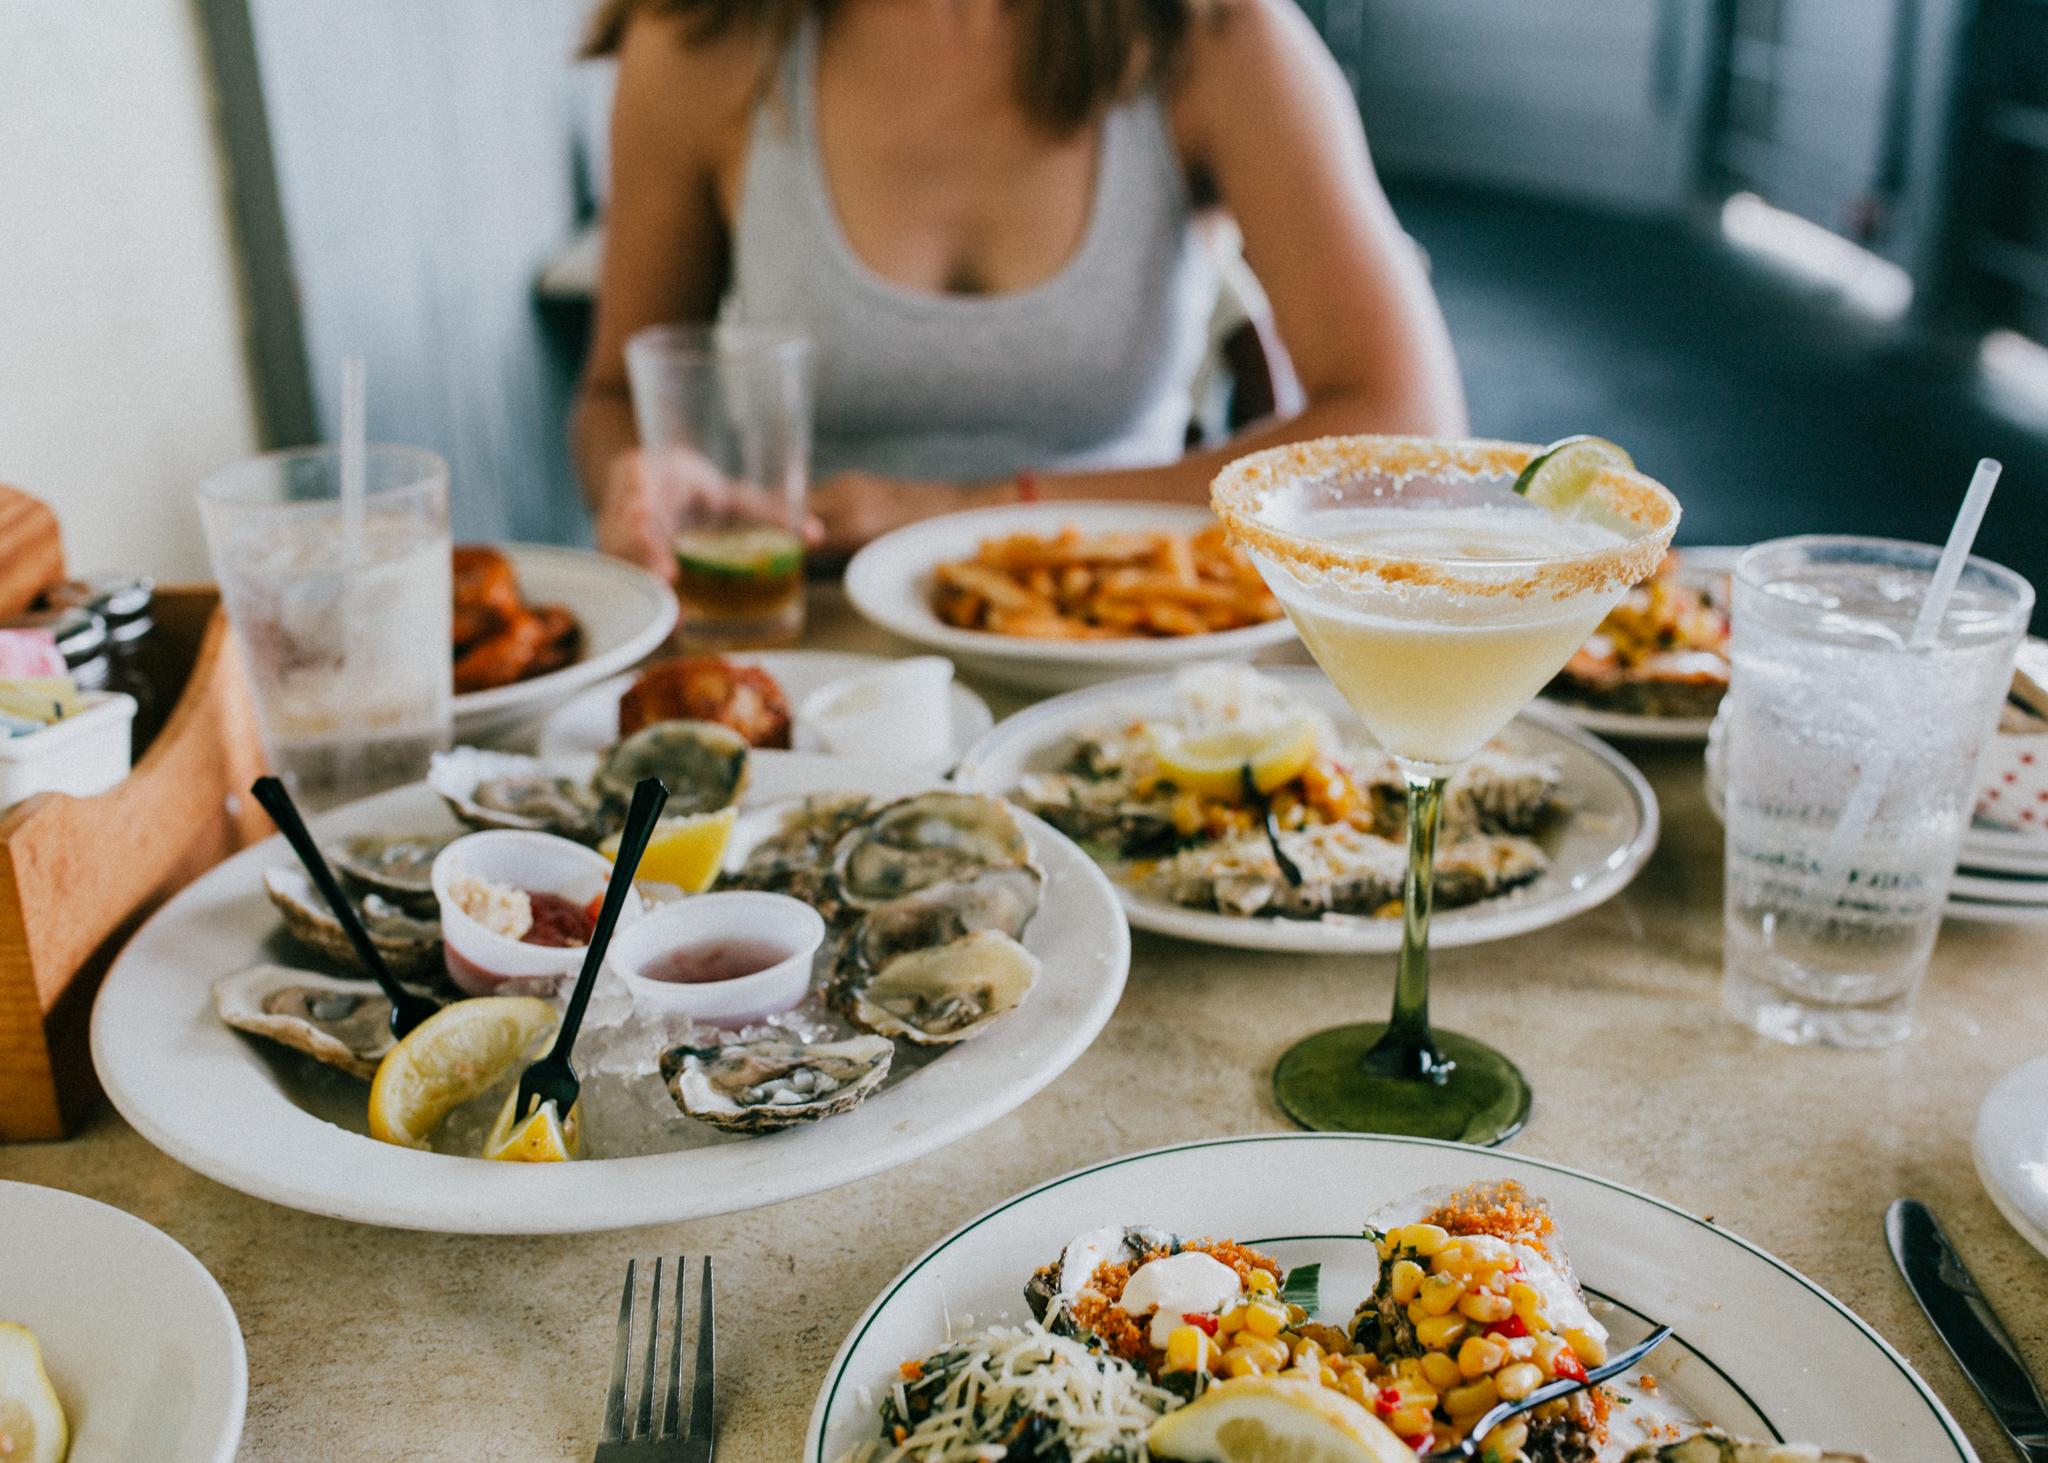 blog, key west, florida, seafood, alonzo, lena perkins, key lime martini, happy hour, visit, tourist, what to eat.jpg.jpg